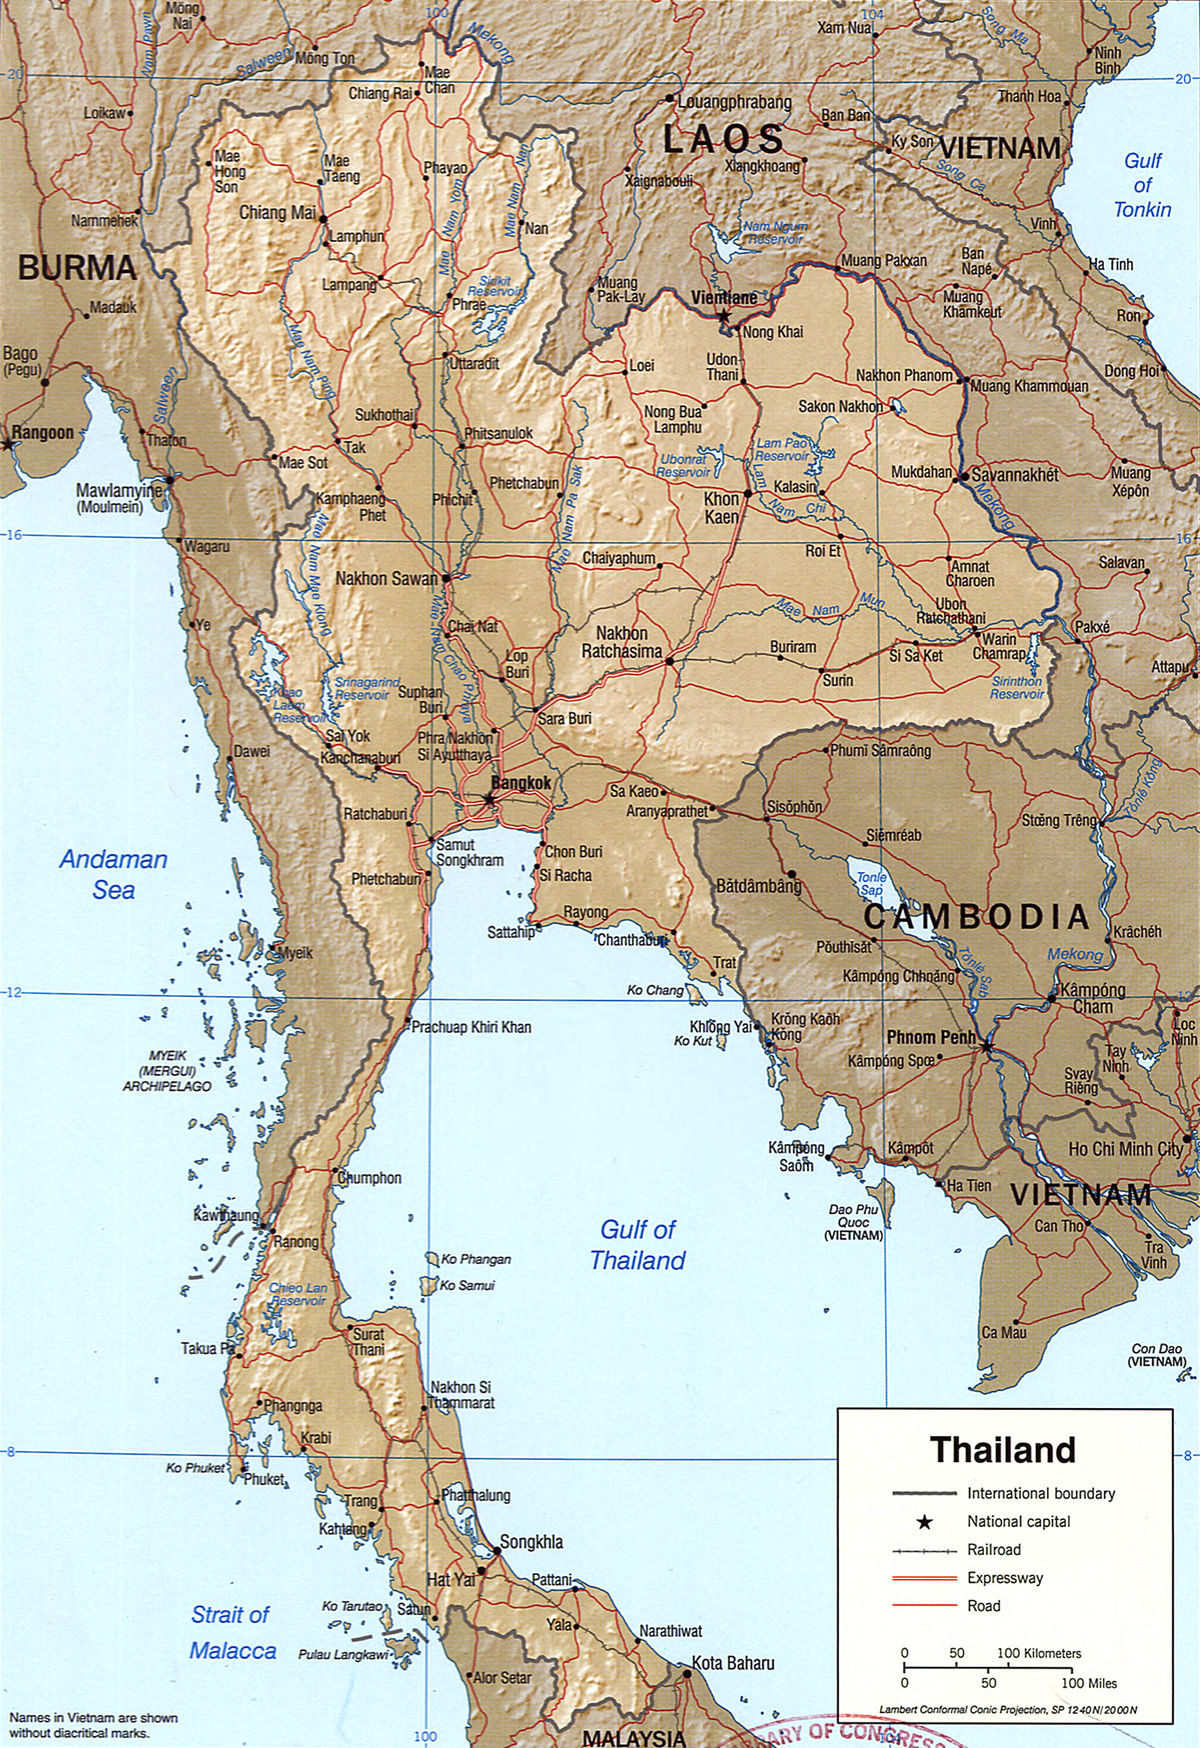 Letak Astronomis Thailand : letak, astronomis, thailand, Geografi, Thailand, Wikipedia, Bahasa, Indonesia,, Ensiklopedia, Bebas